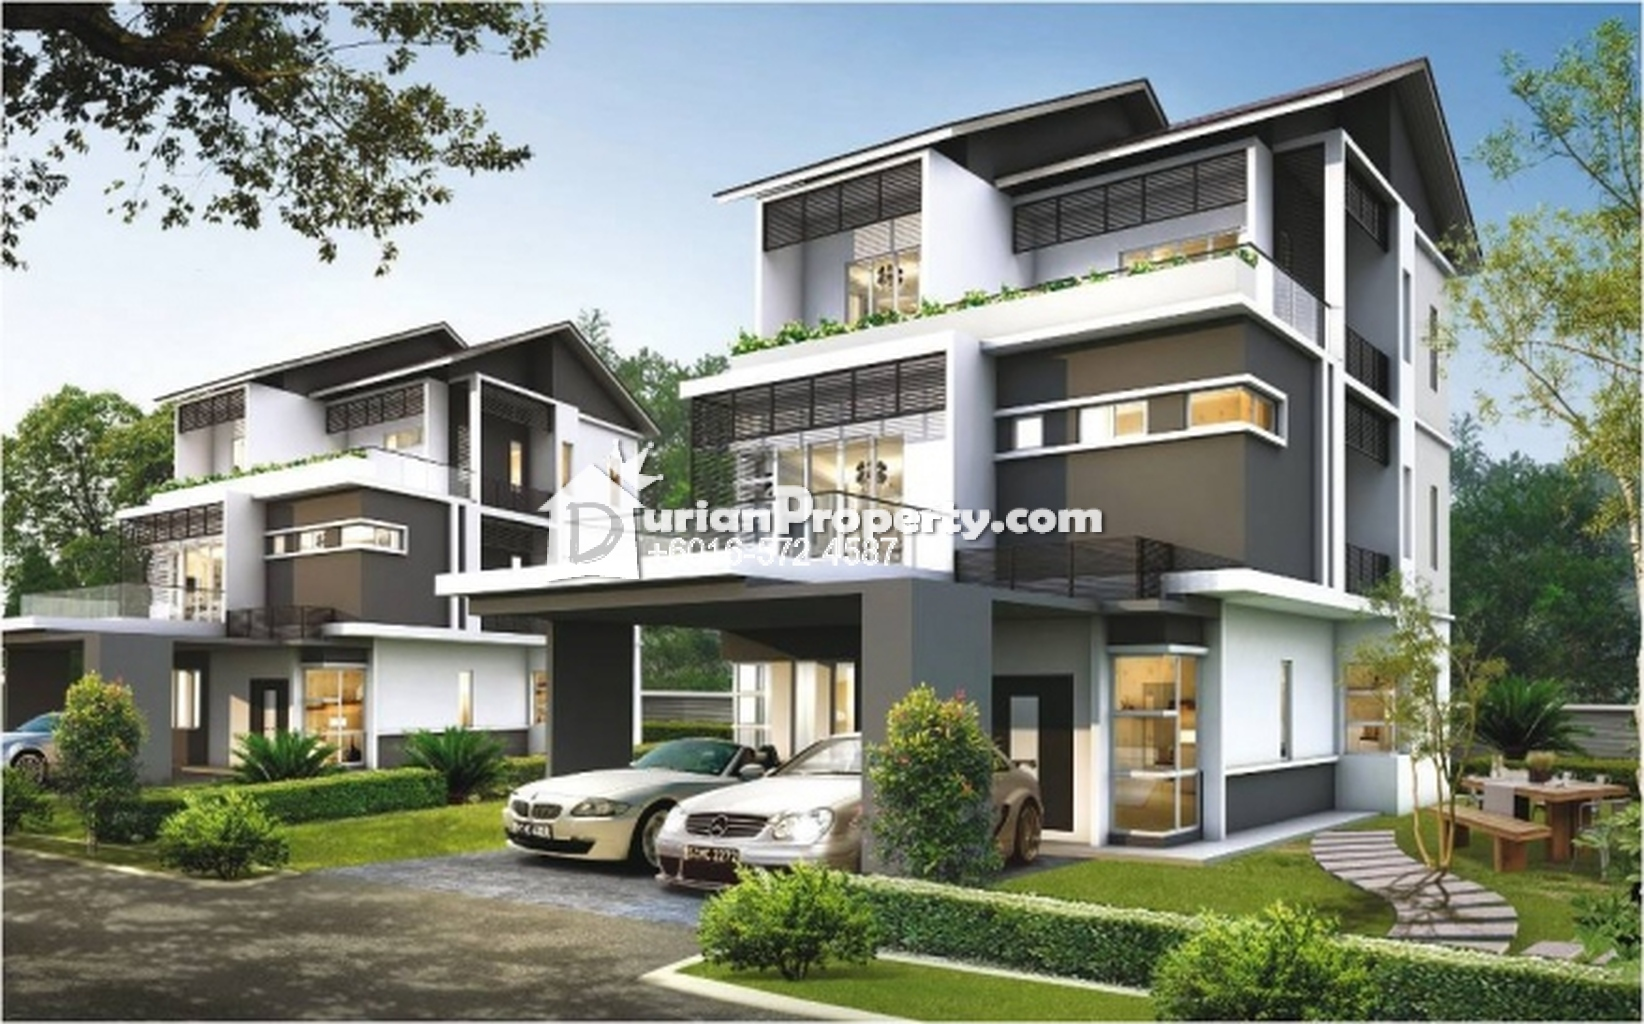 Bungalow house for sale at symphony park cyberjaya for rm for Bungalow house for sale